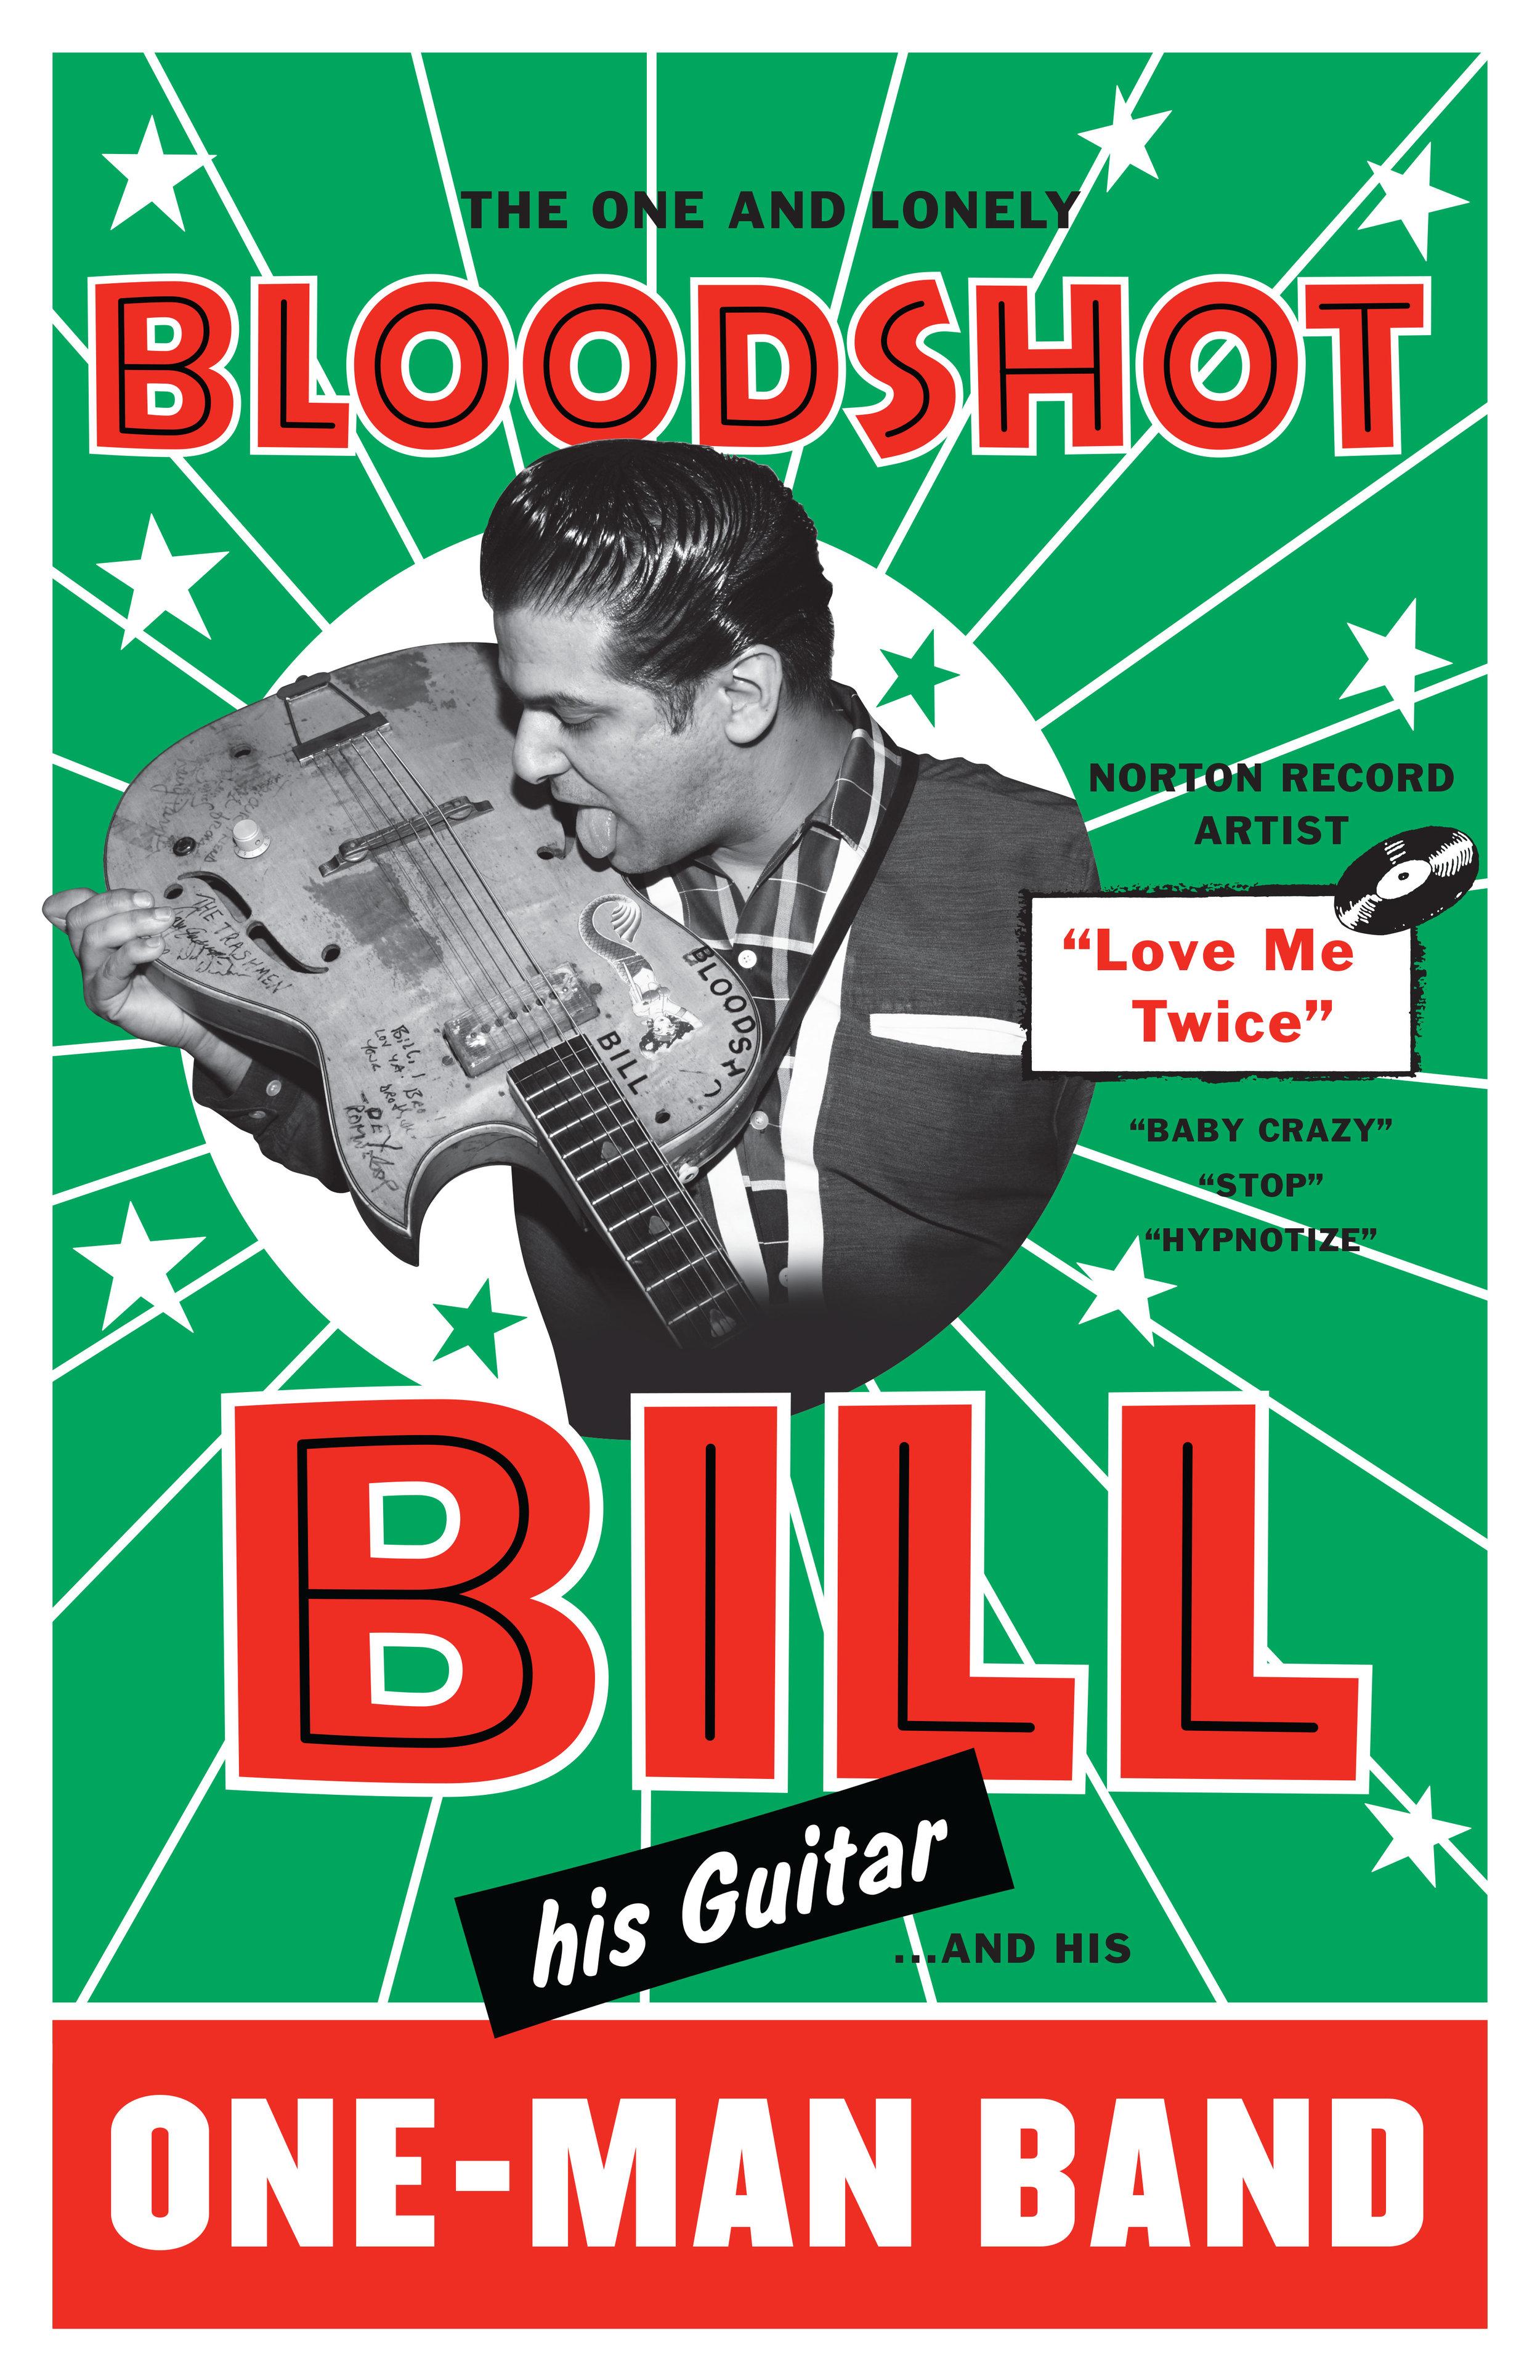 Bloodshot Bill poster